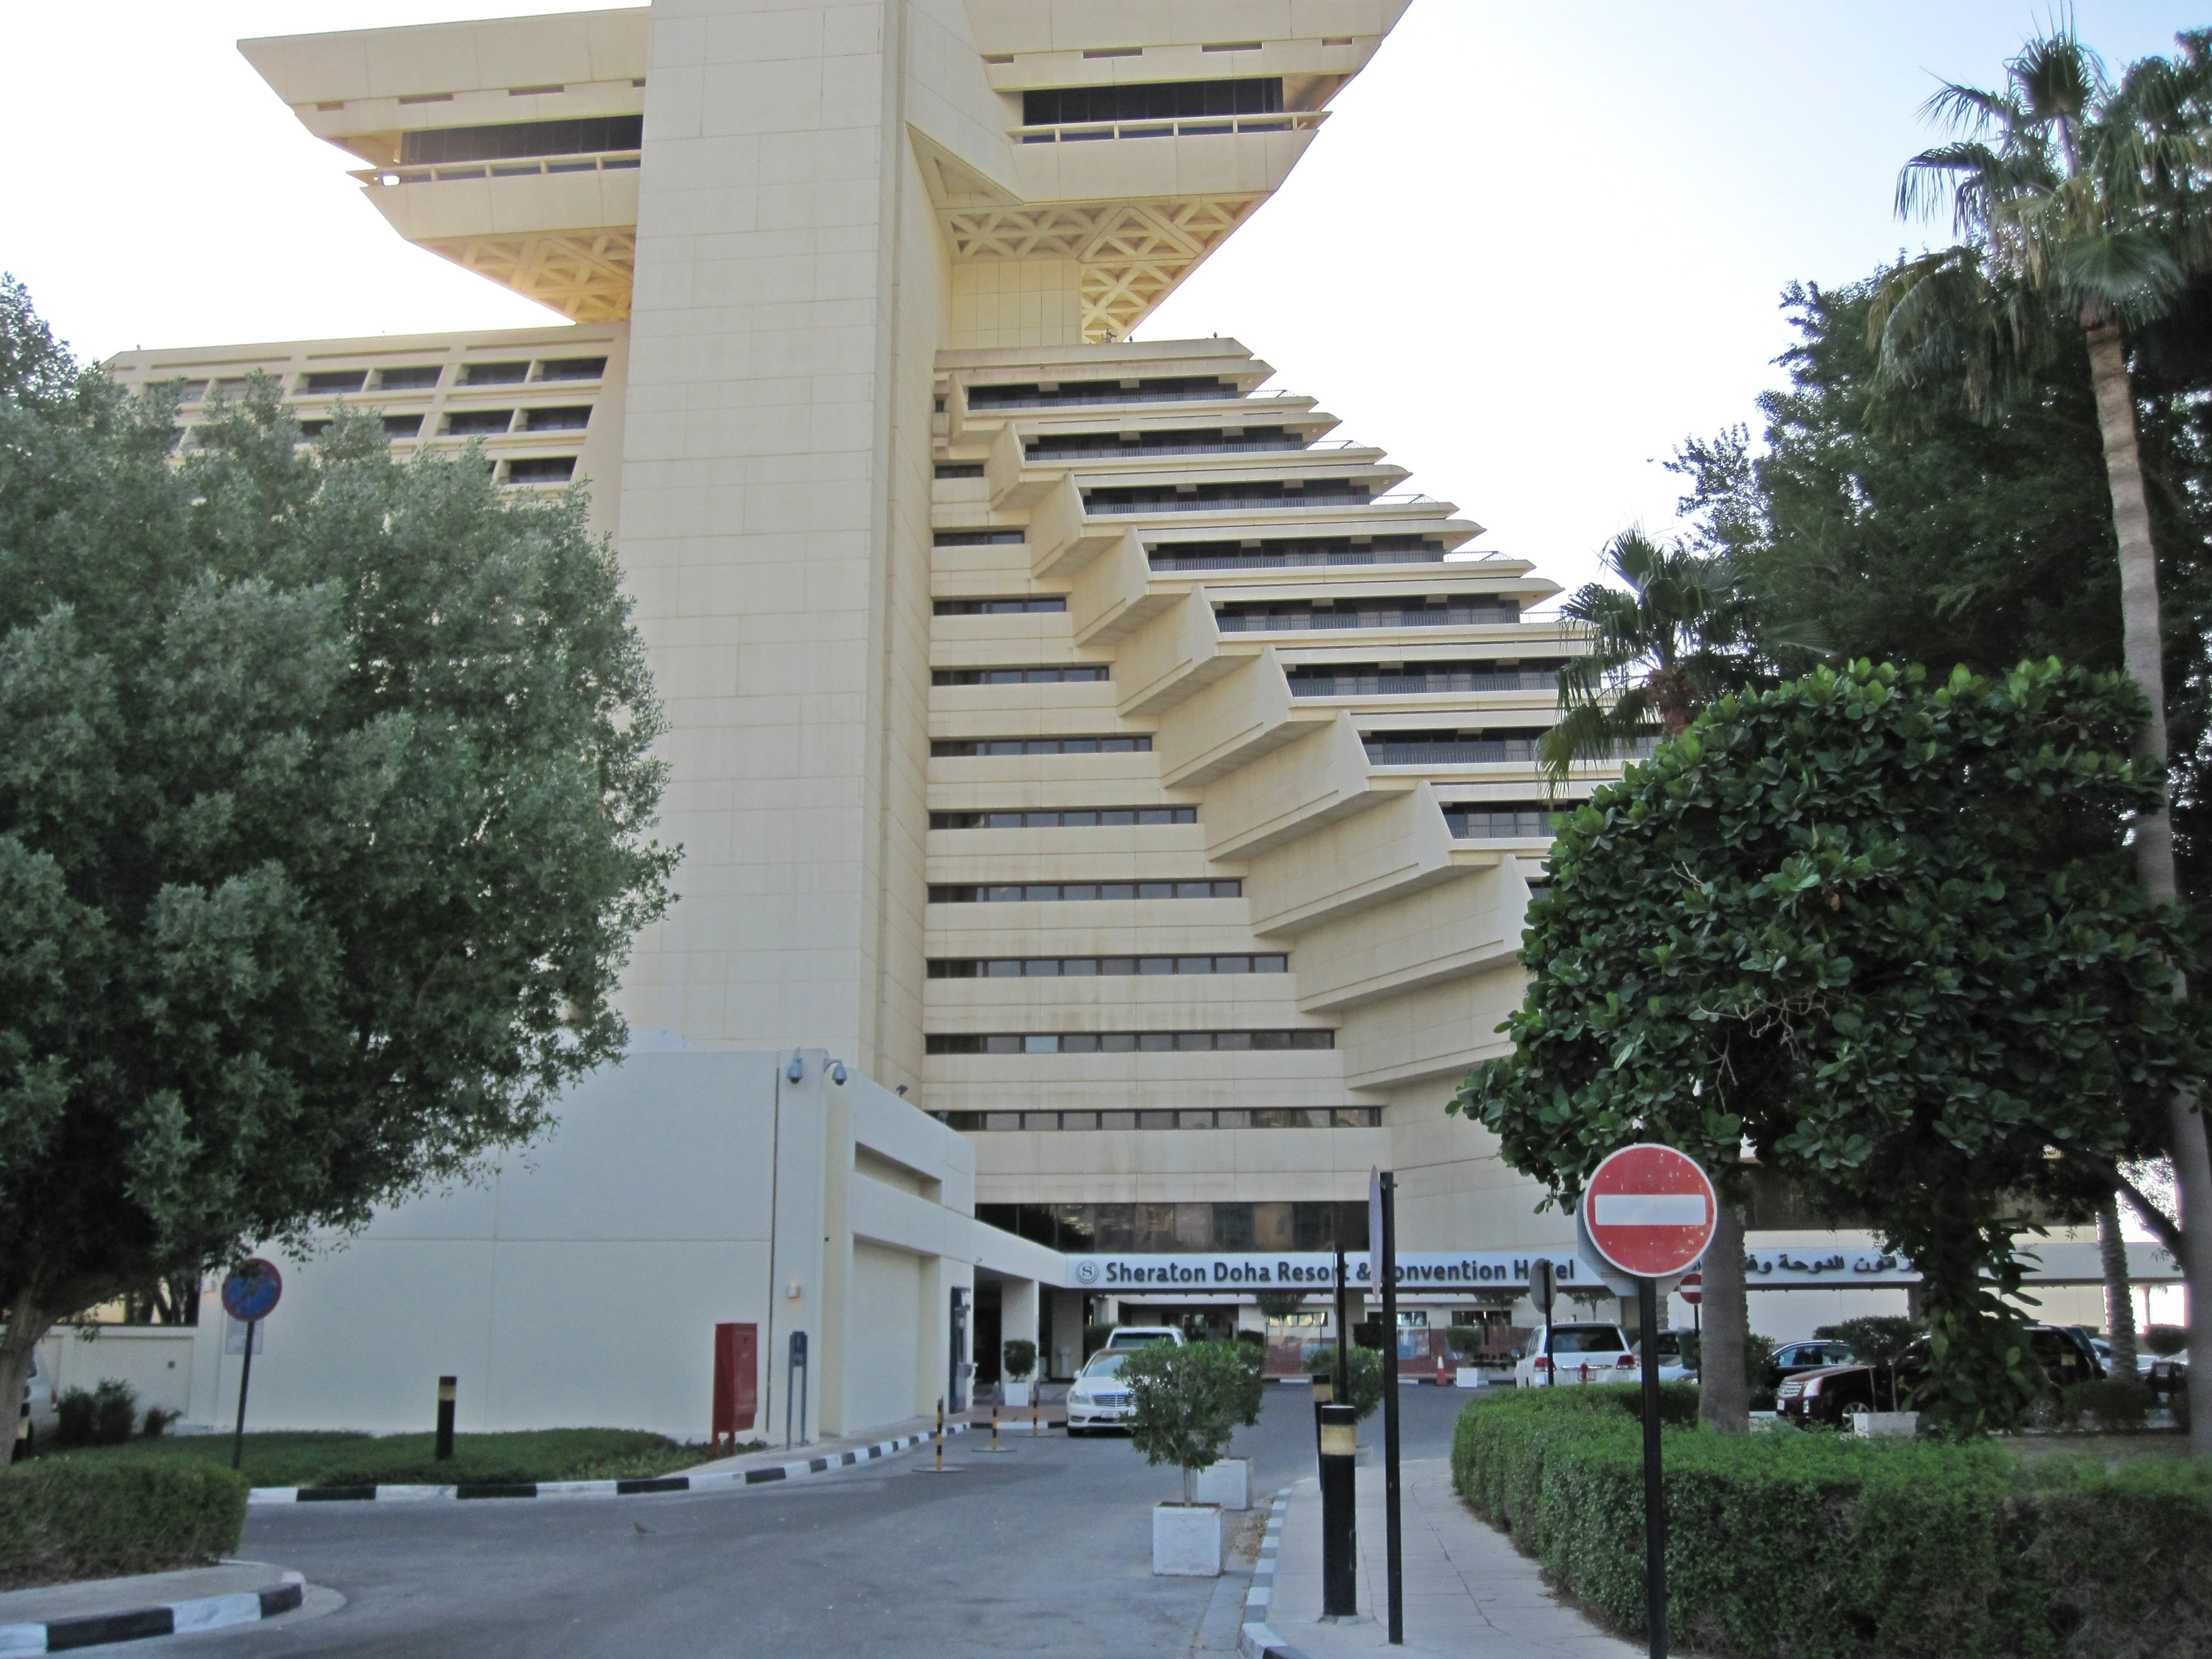 Sheraton Grand Doha Resort Convention Hotel   Wikipedia 4000x3000